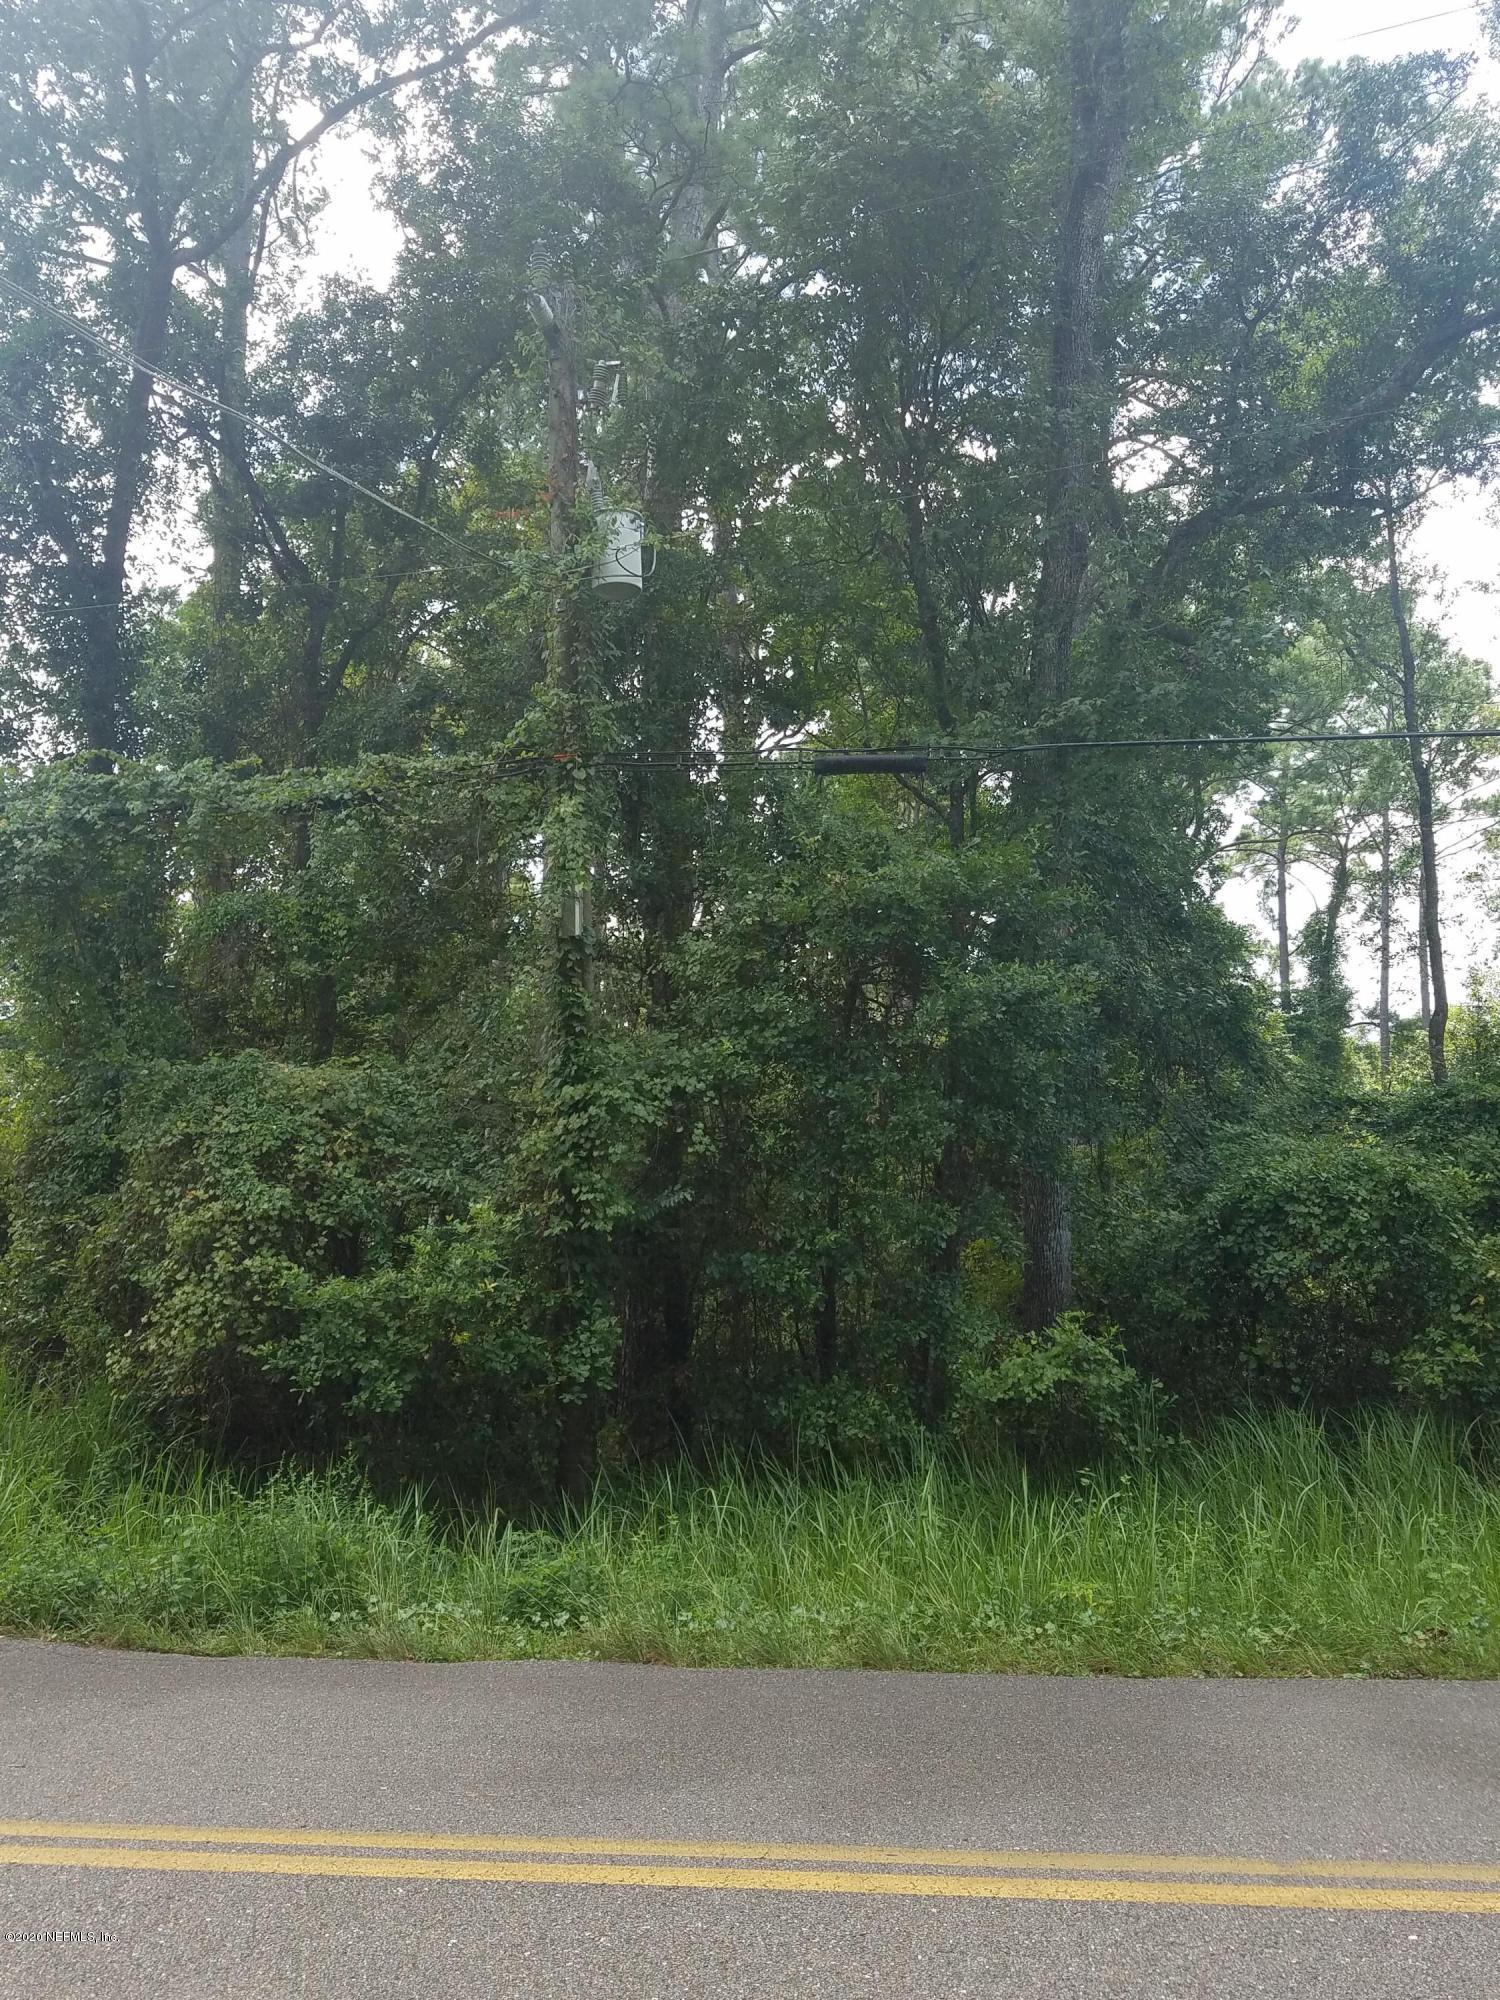 0 YULEE HILLS, YULEE, FLORIDA 32097, ,Vacant land,For sale,YULEE HILLS,1066127